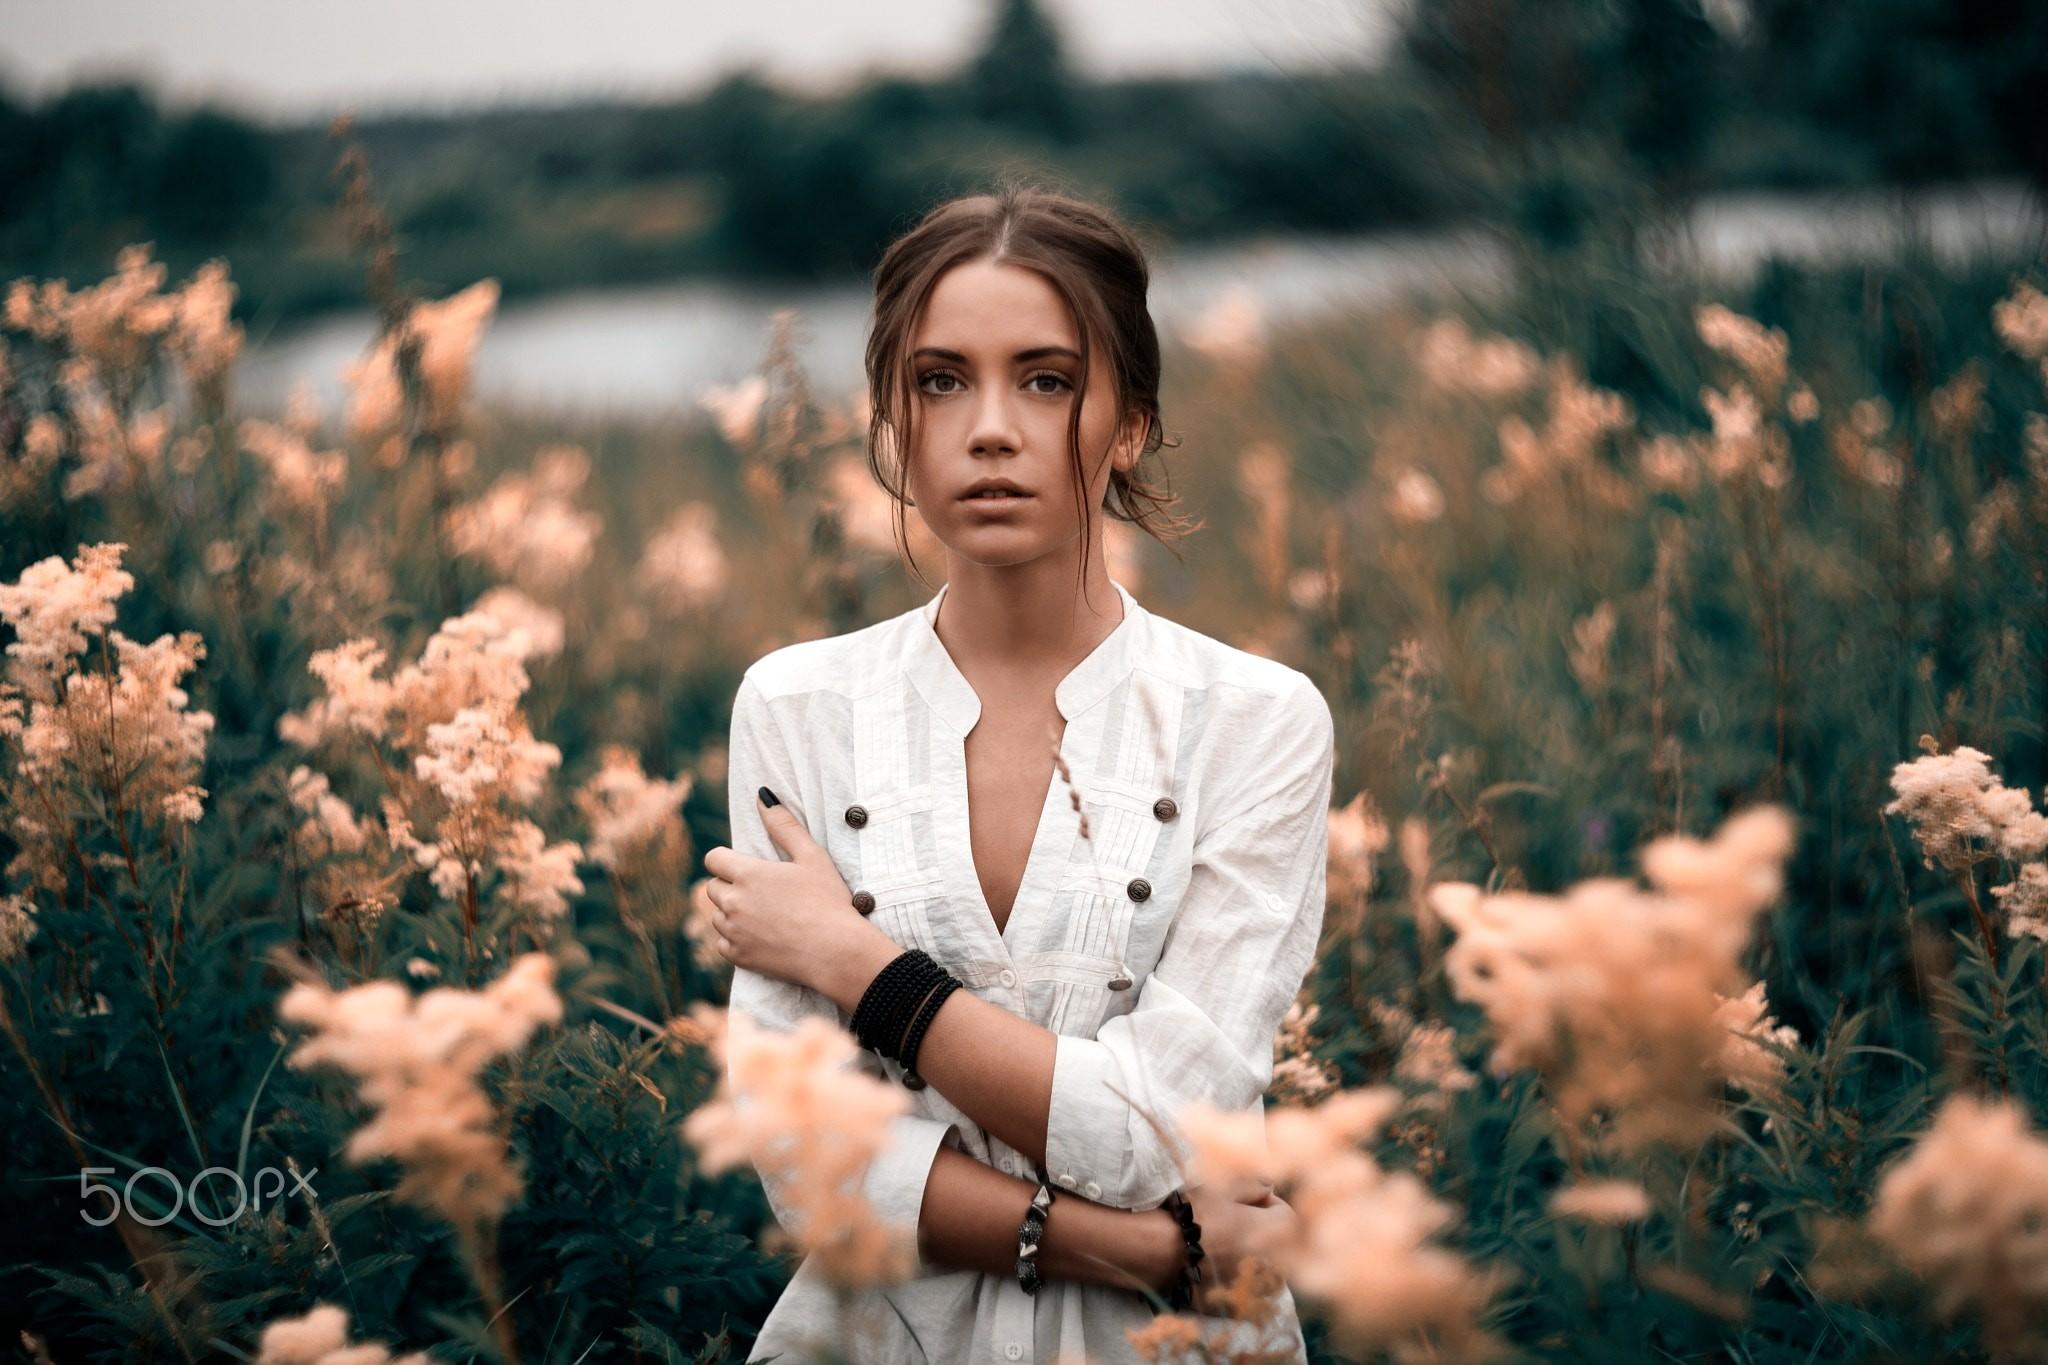 Hintergrundbilder Frau Portrat Hemd Im Bett Xenia Kokoreva